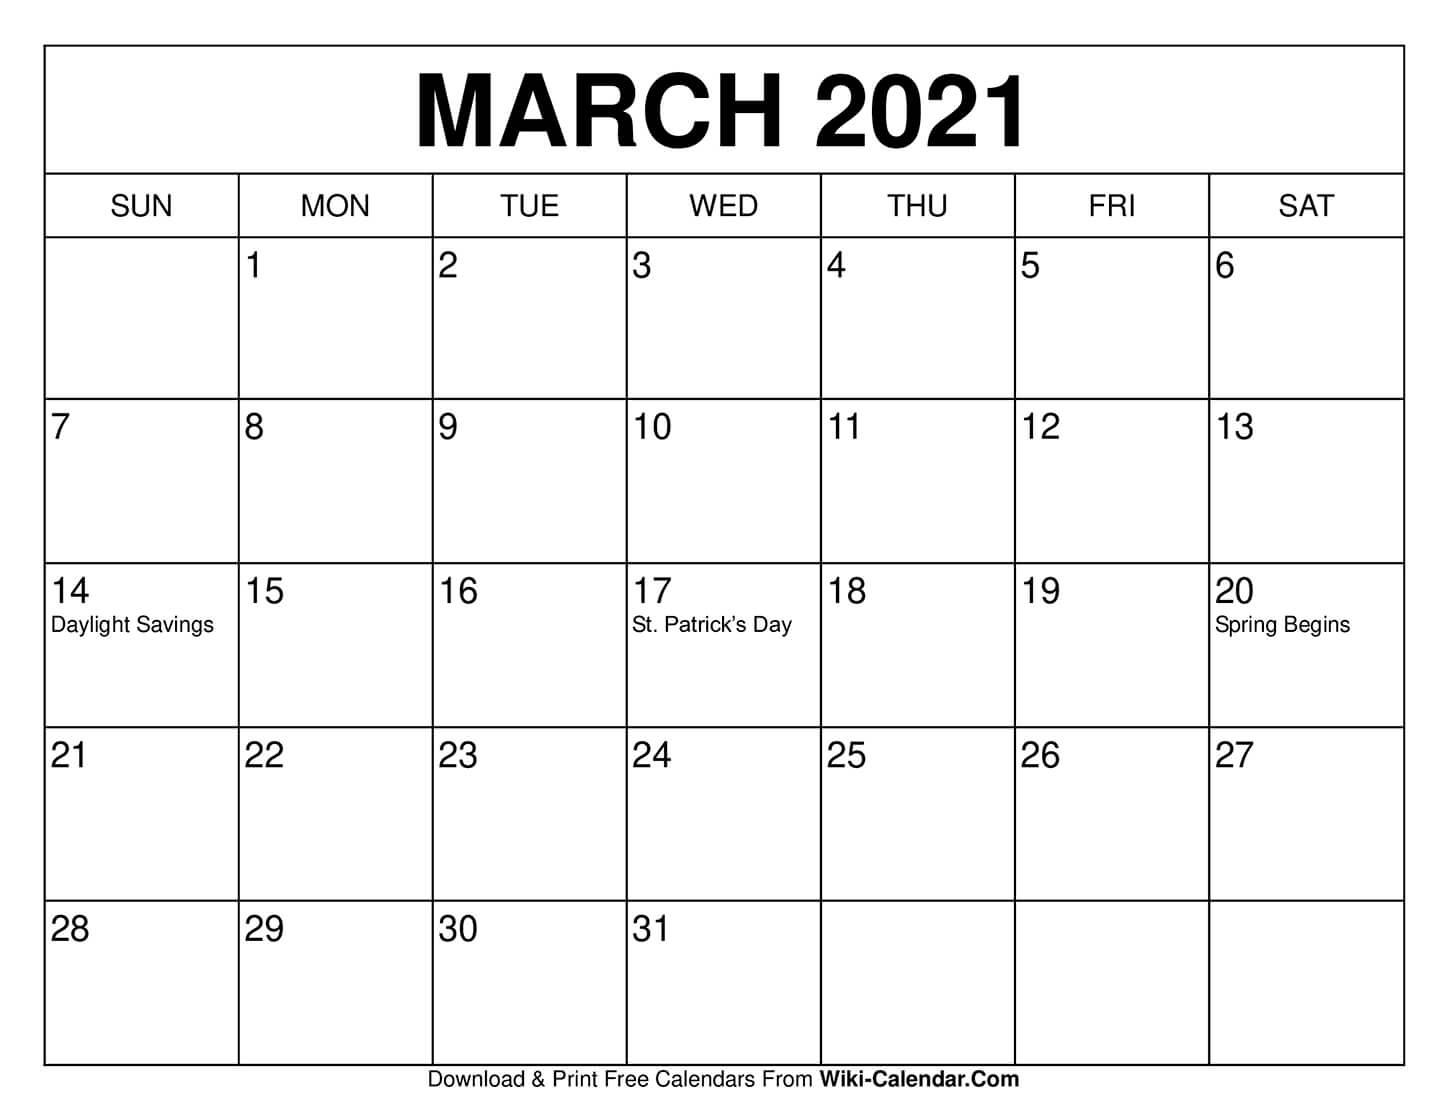 March 2021 Printable Calendar   Free 2021 Printable Calendars